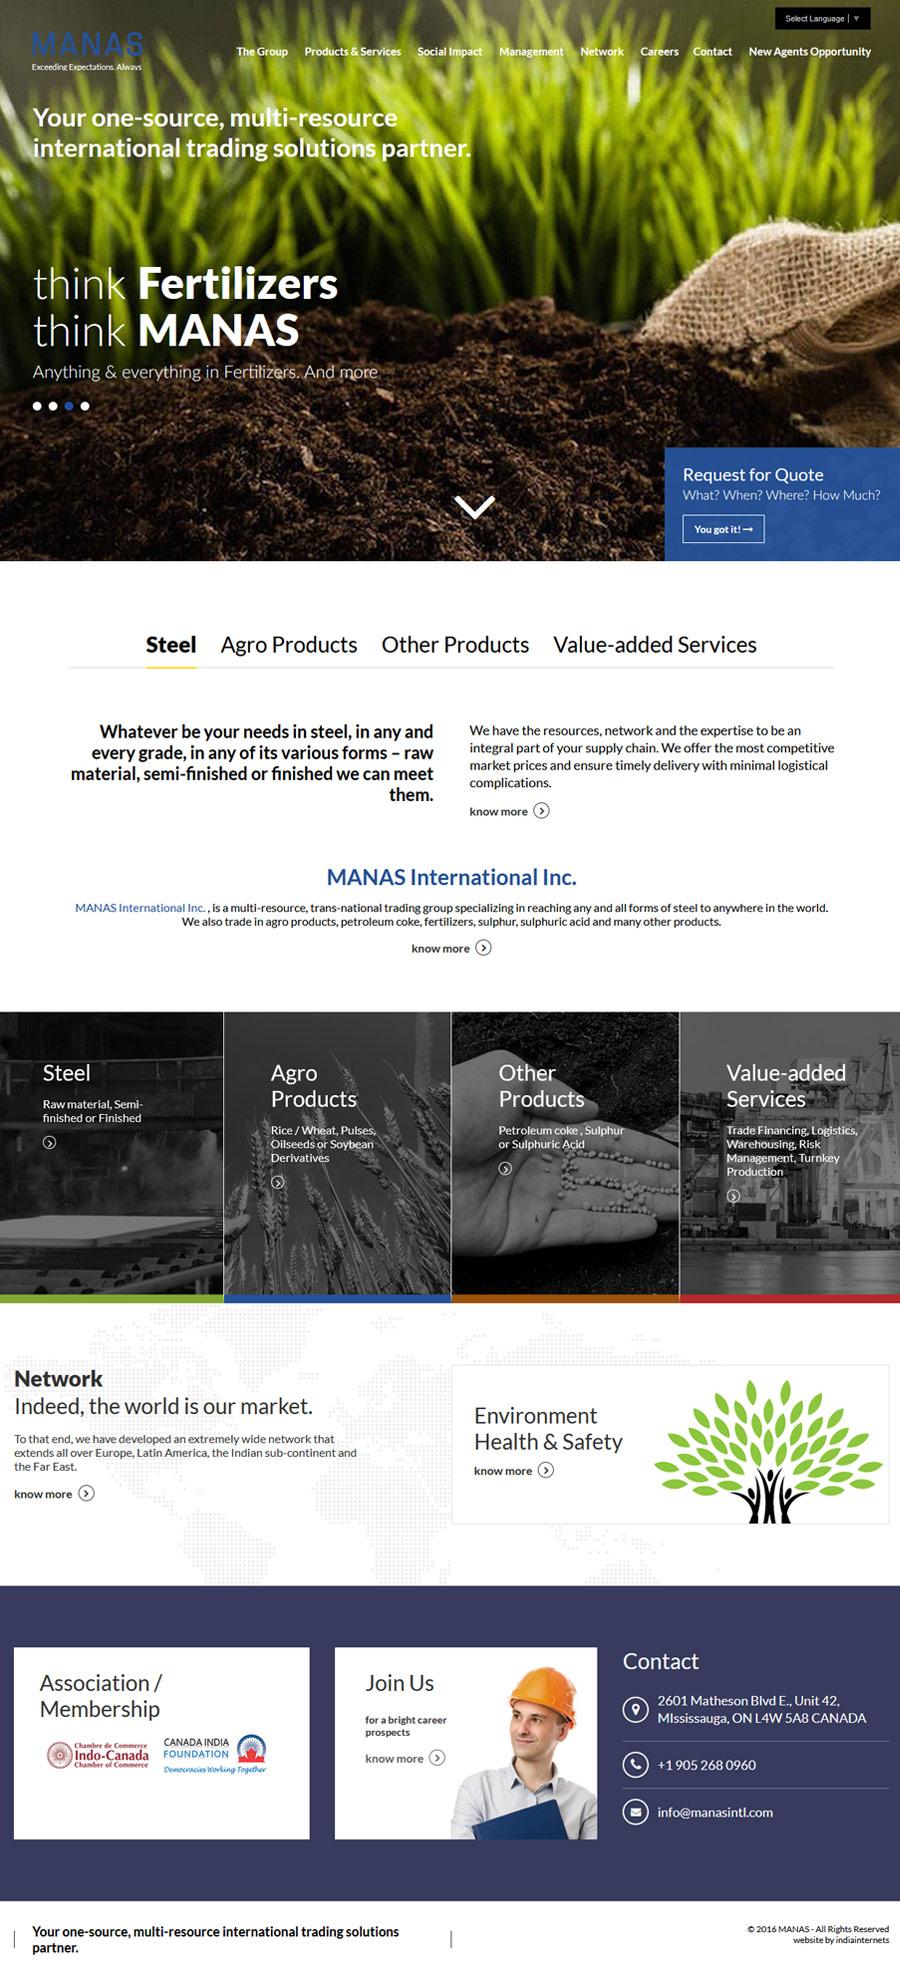 Manas International